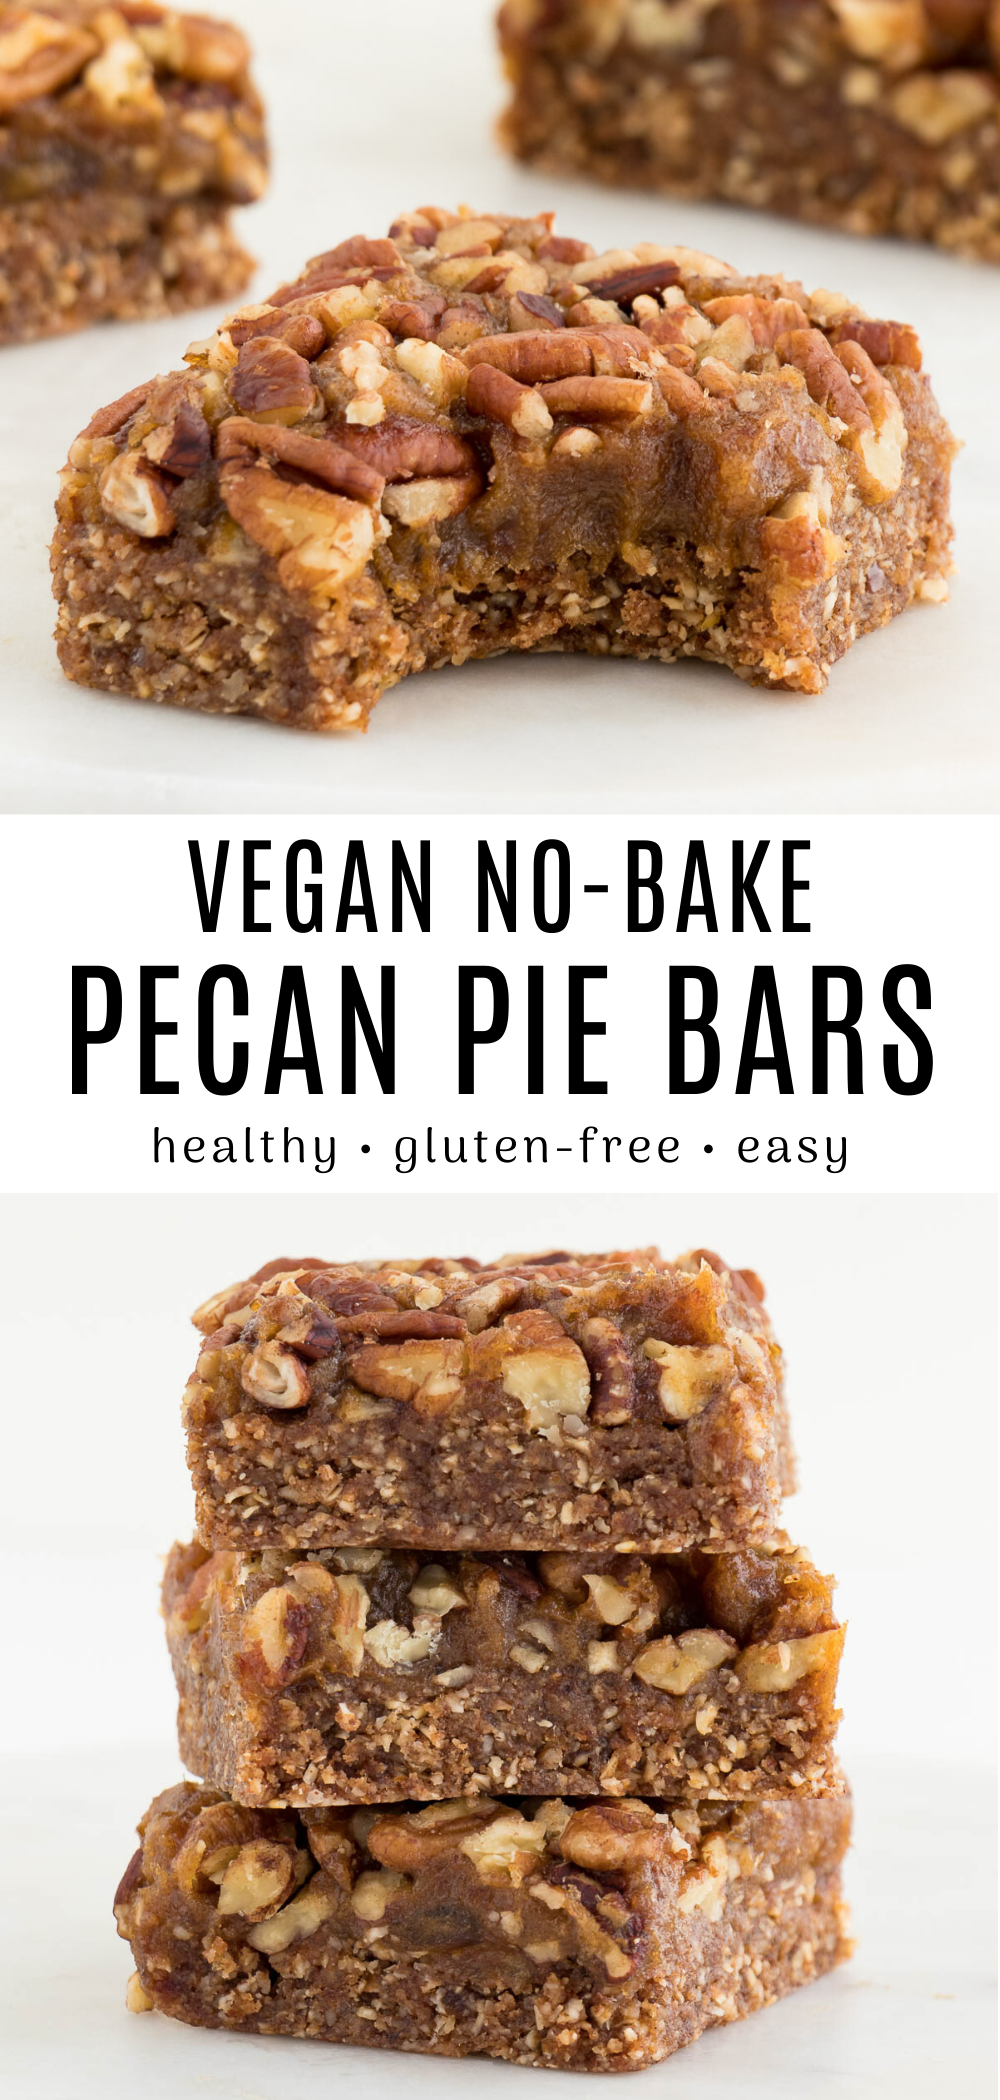 No-Bake Pecan Pie Bars (Vegan, Gluten-Free) | Purely Kaylie